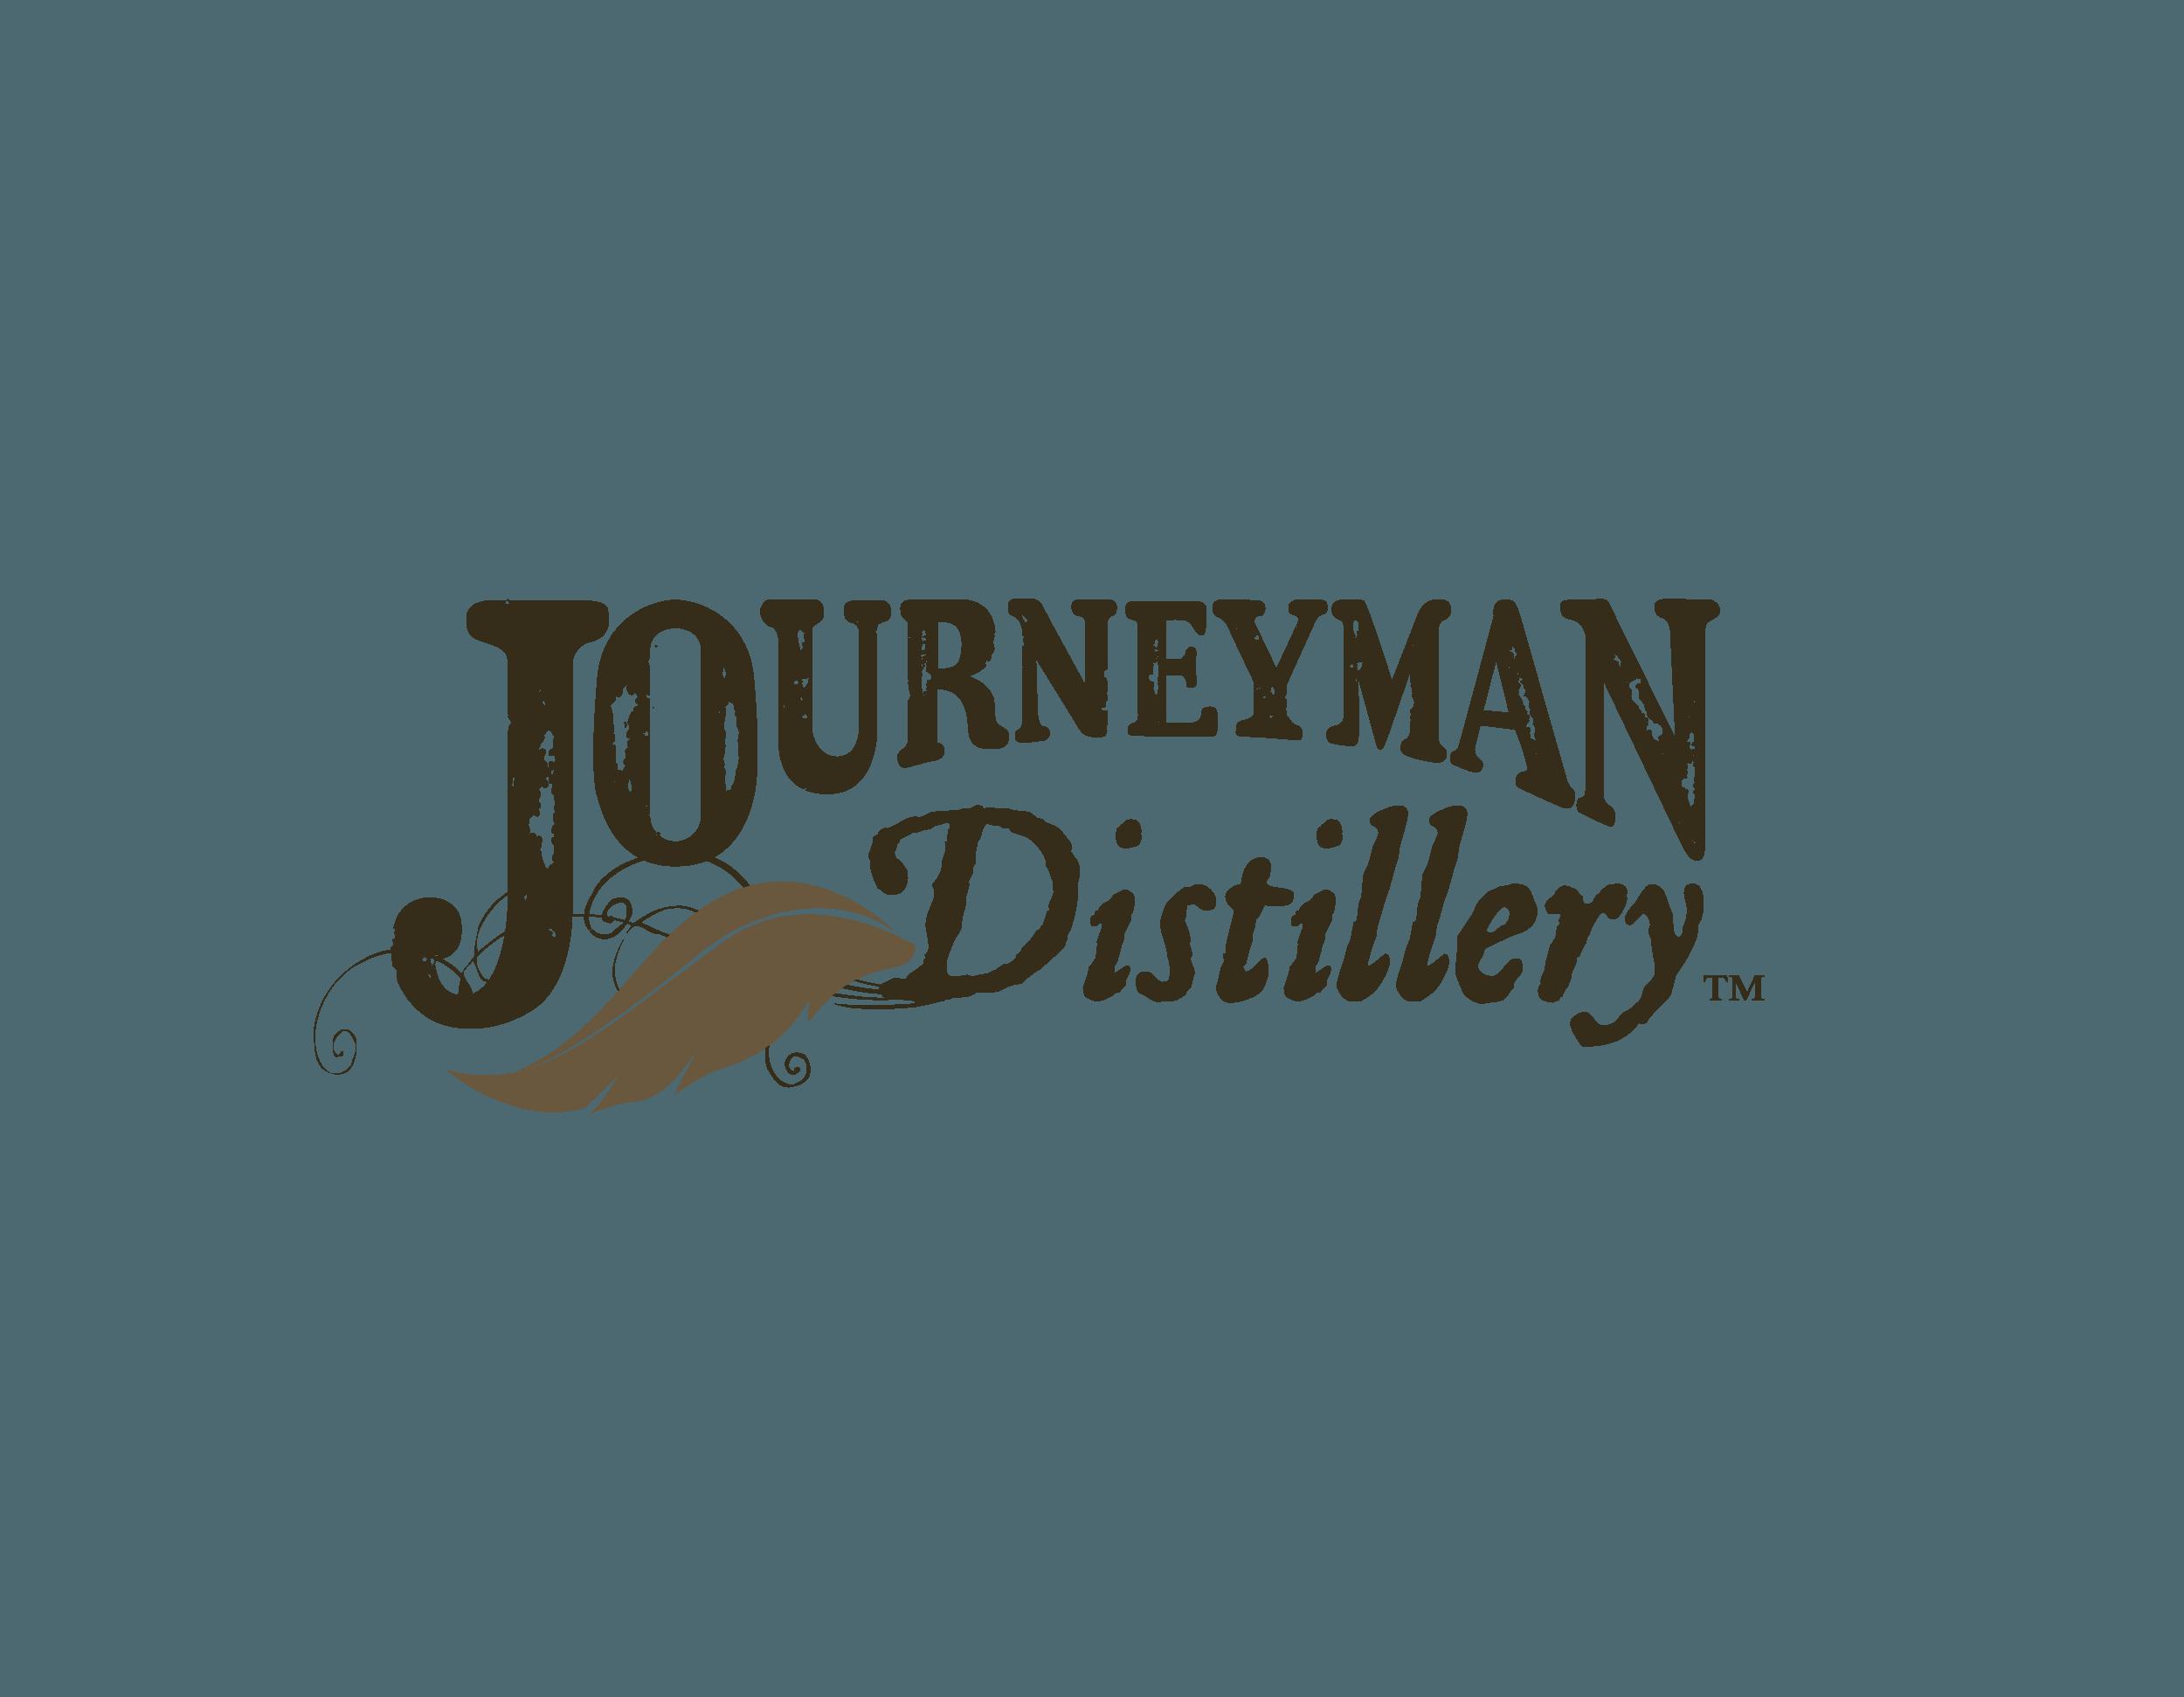 Journeyman Distillery@300x-8.png